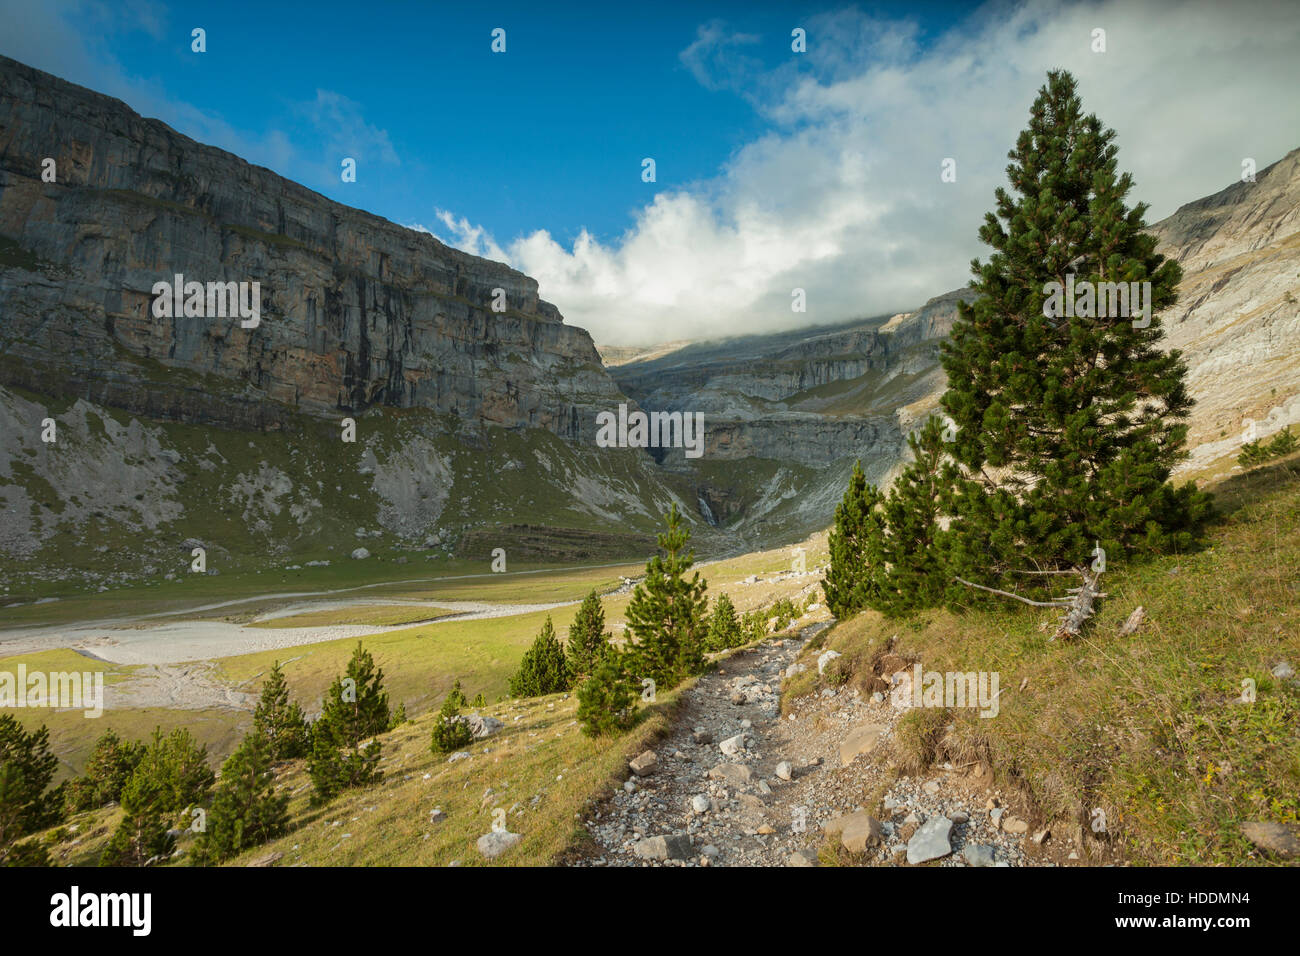 Ordesa y Monte Perdido Nationalpark, Huesca, Aragon, Spanien, Pyrenäen. Stockbild